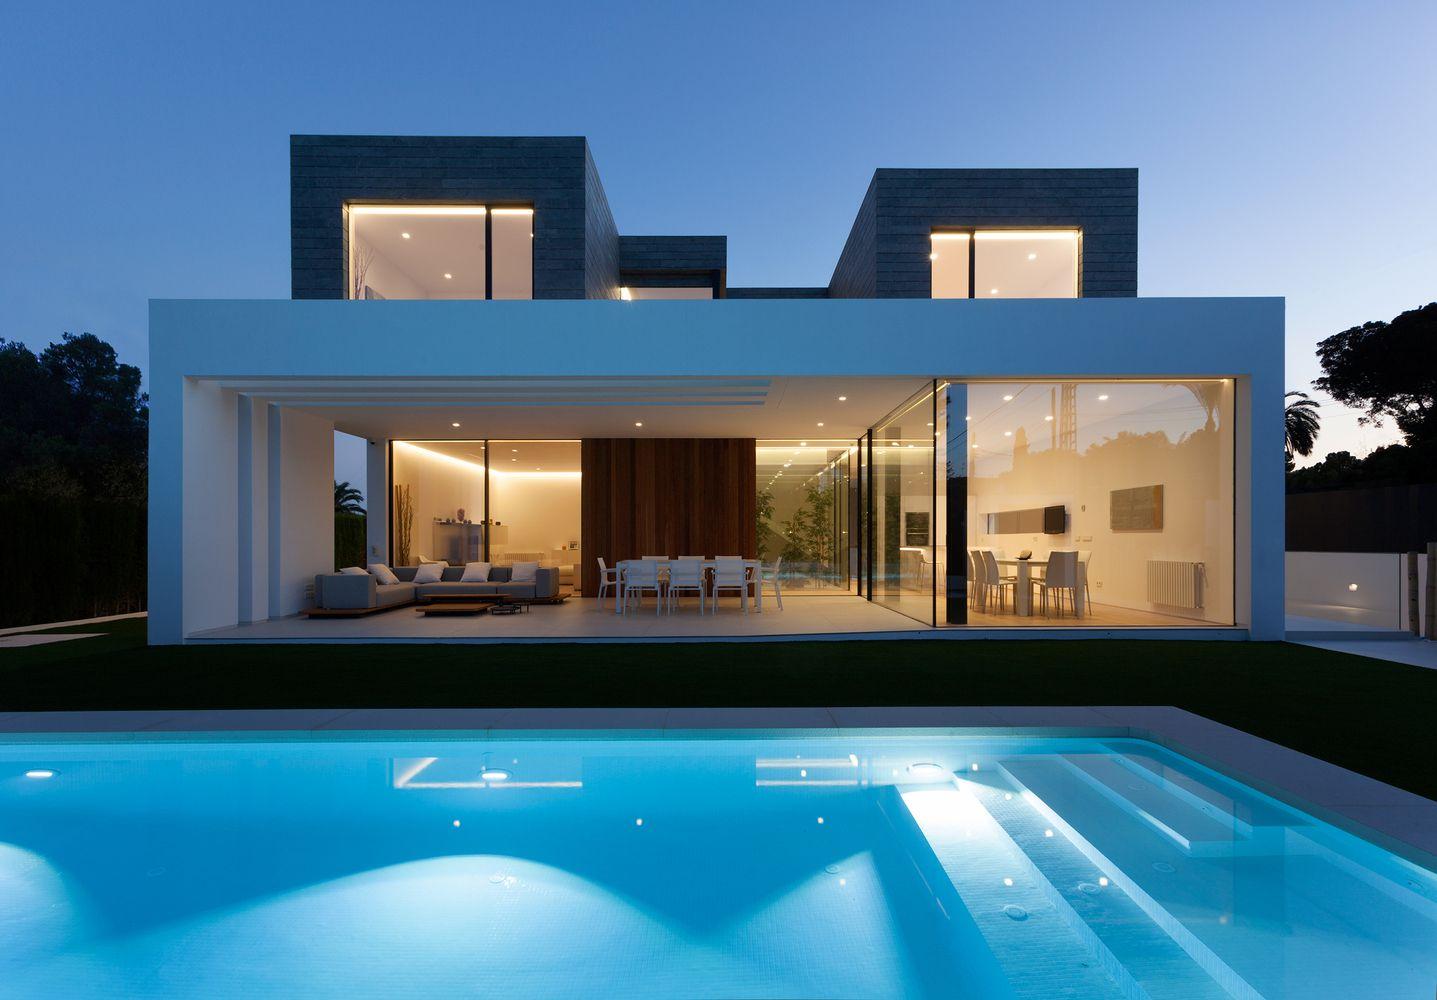 Gallery Of La Canada House Antonio Altarriba Comes 1 Casas Con Piscina Fachadas De Casas Campestres Casas Modernas Arquitectura